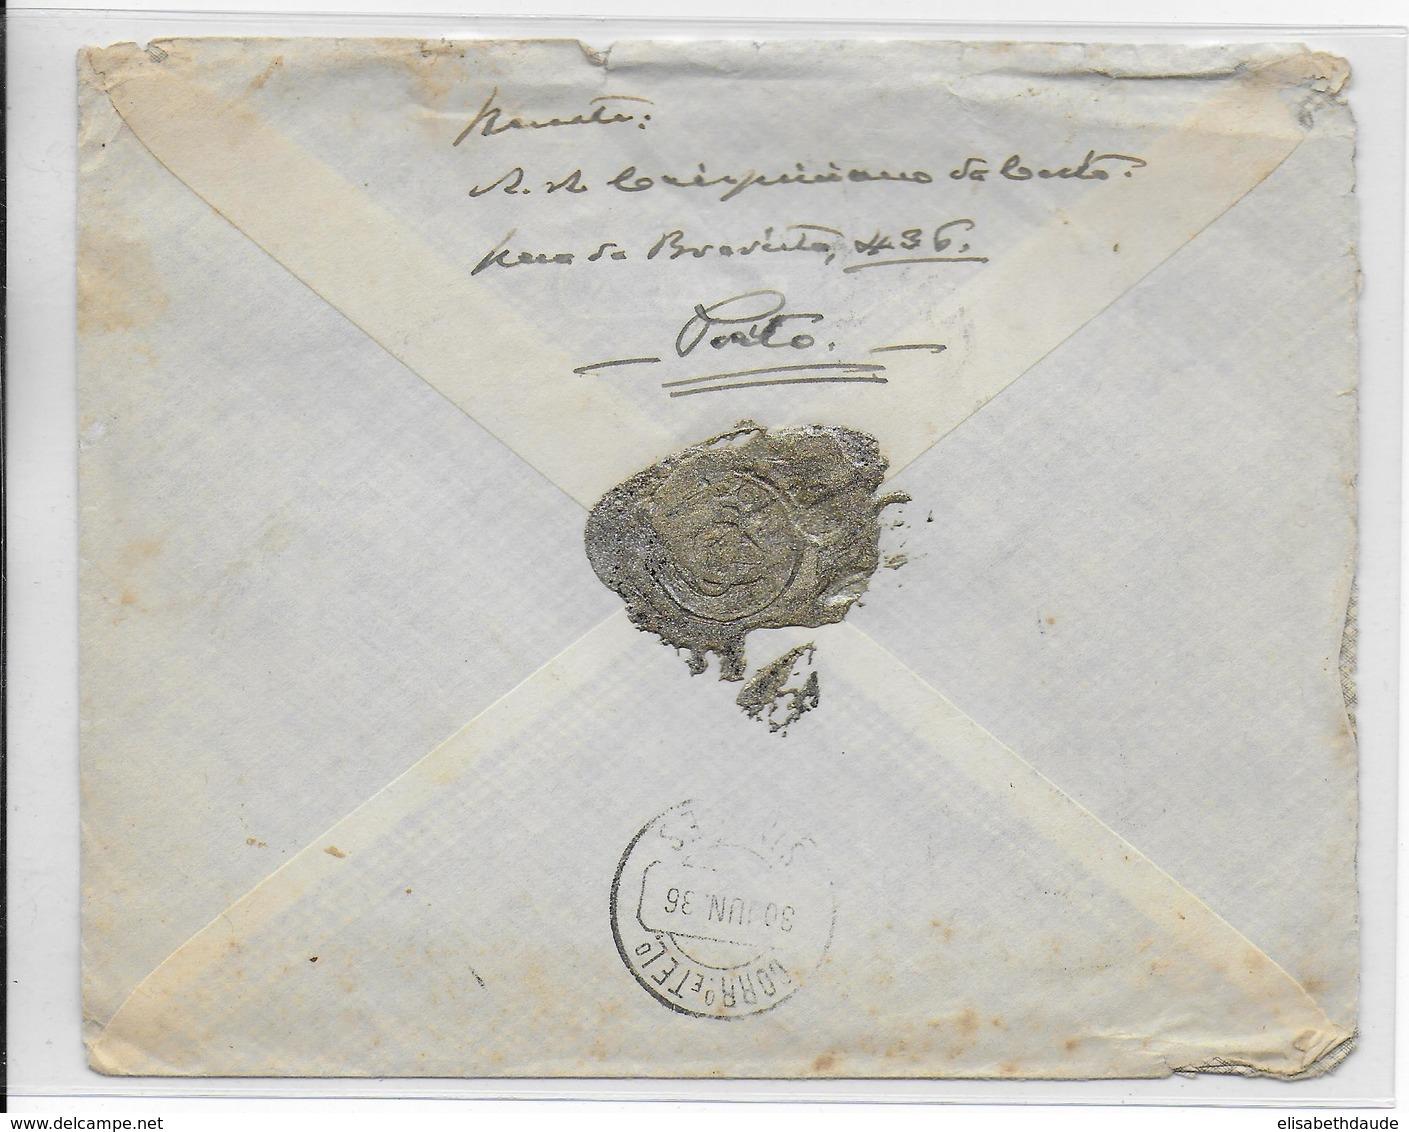 PORTUGAL - 1936 - ENVELOPPE RECOMMANDEE De S.BENTO => SINFOES - Lettres & Documents